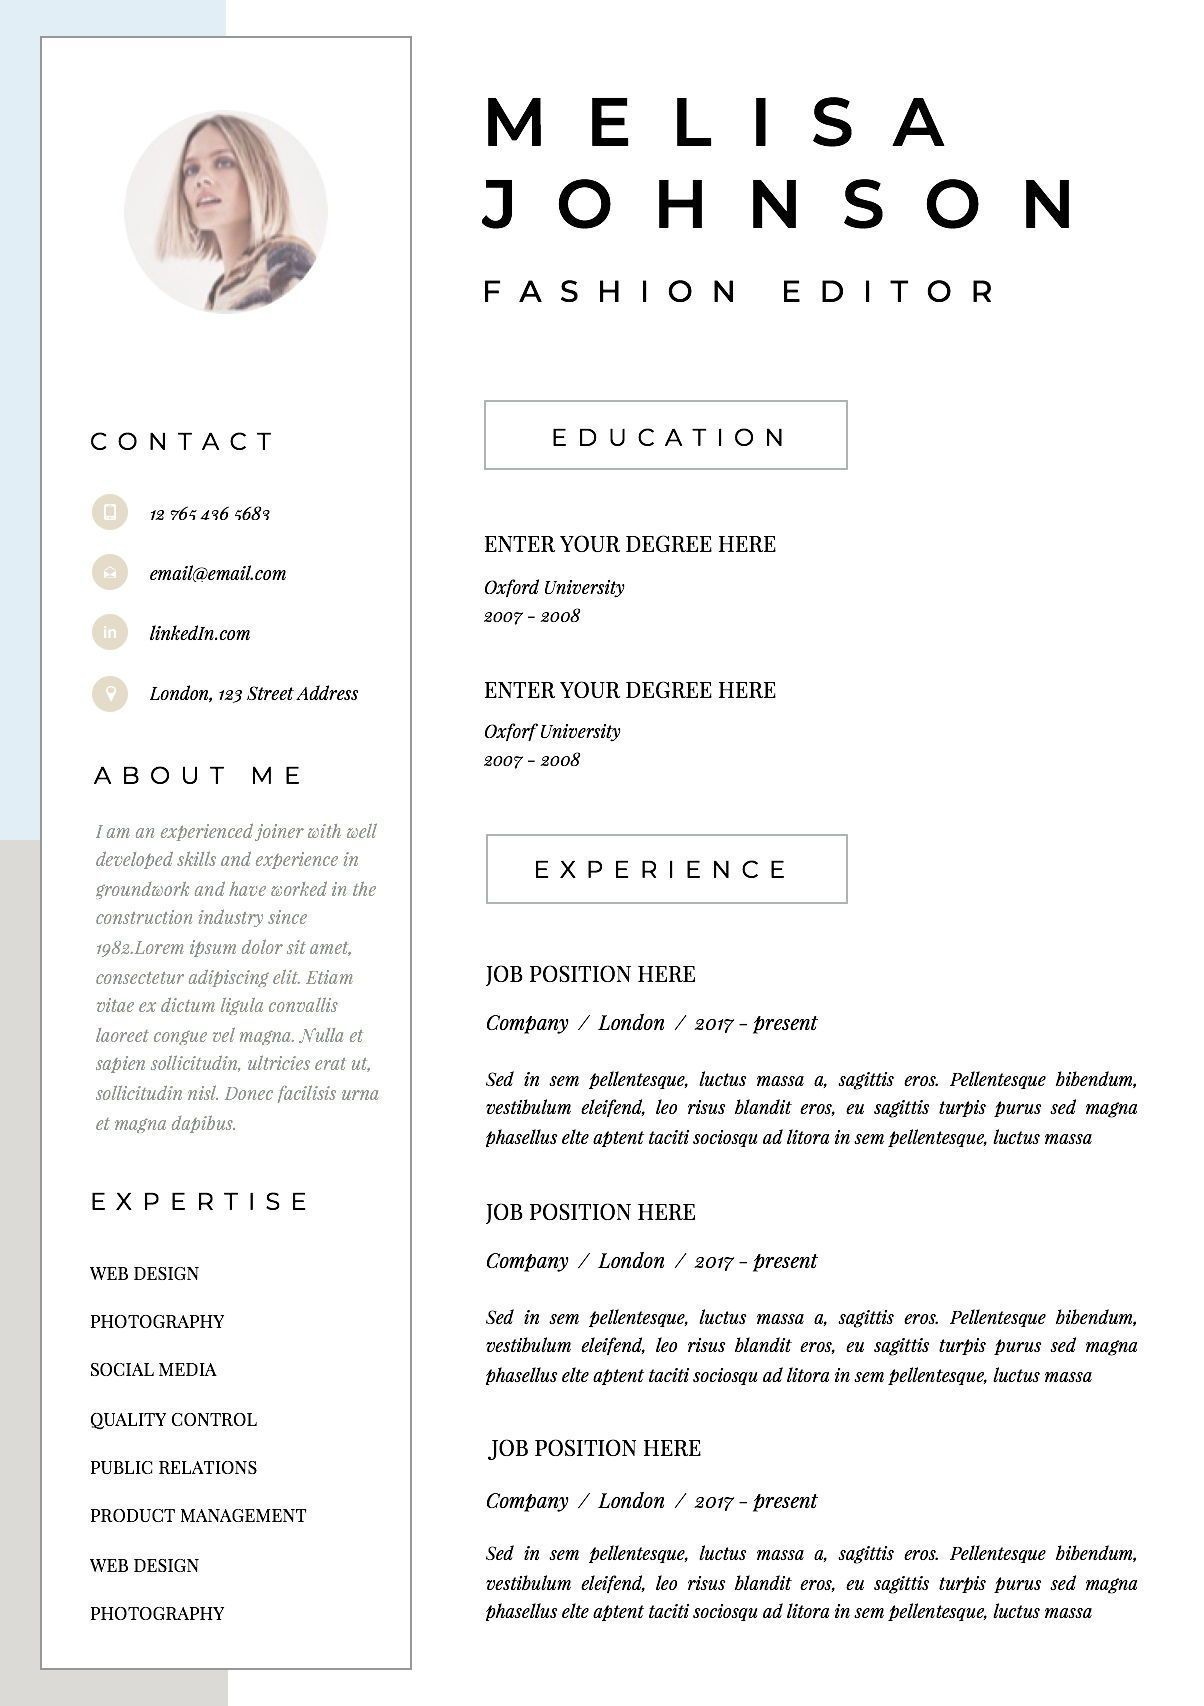 Resume Template Cv Template Resume Cv Design Teacher Resume Curriculum Vitae Cv Instant Download Resume C Resume Kreatif Cv Kreatif Desain Resume